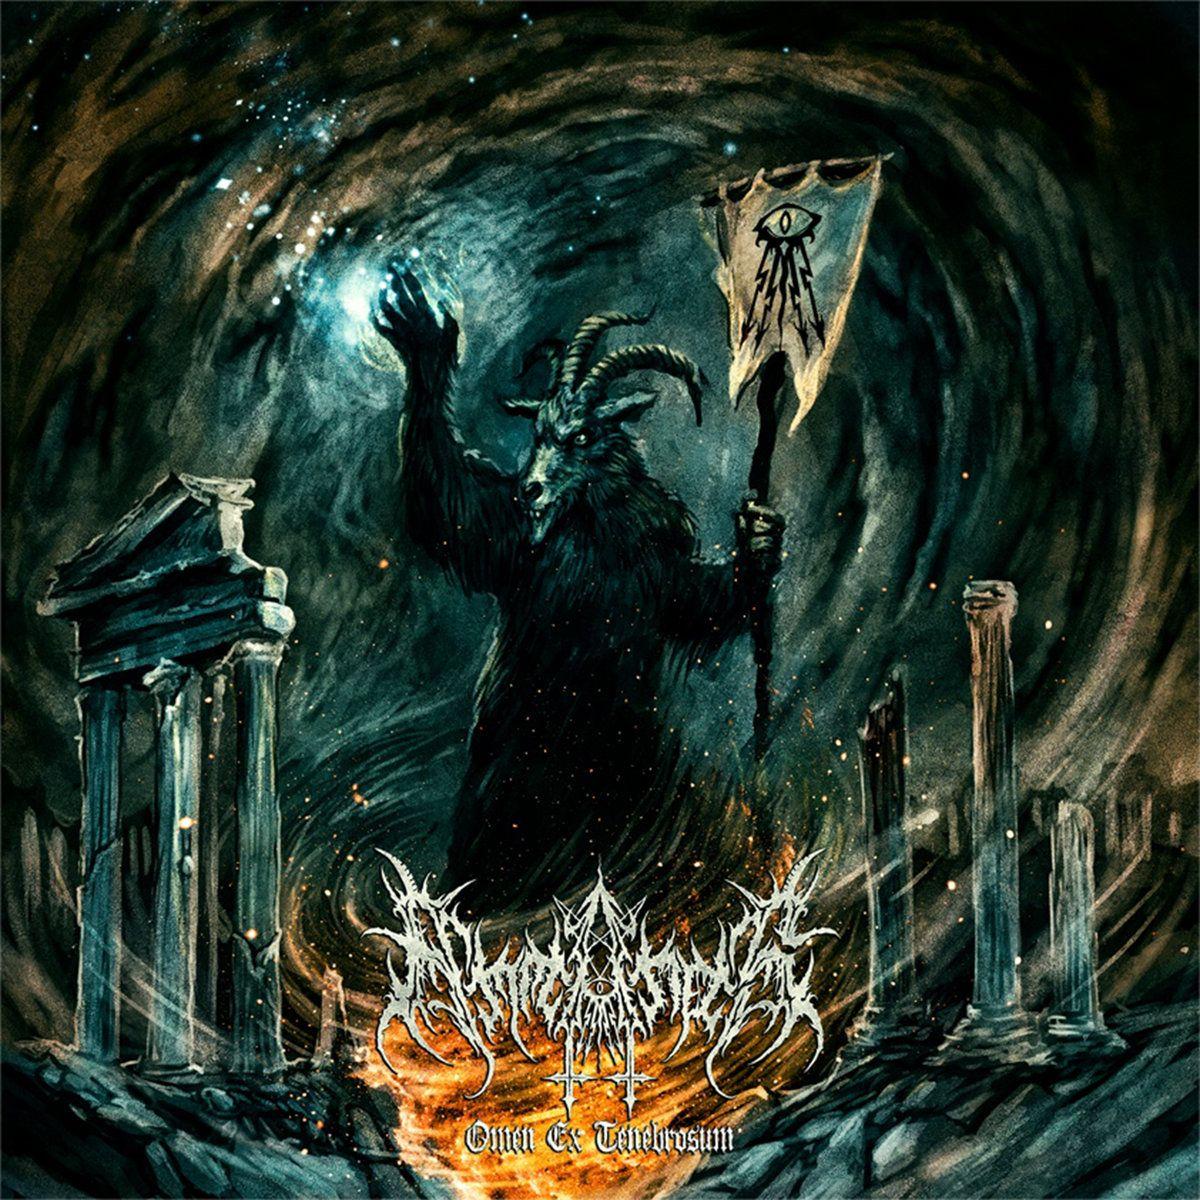 Review for Ammanas - Omen Ex Tenebrosum